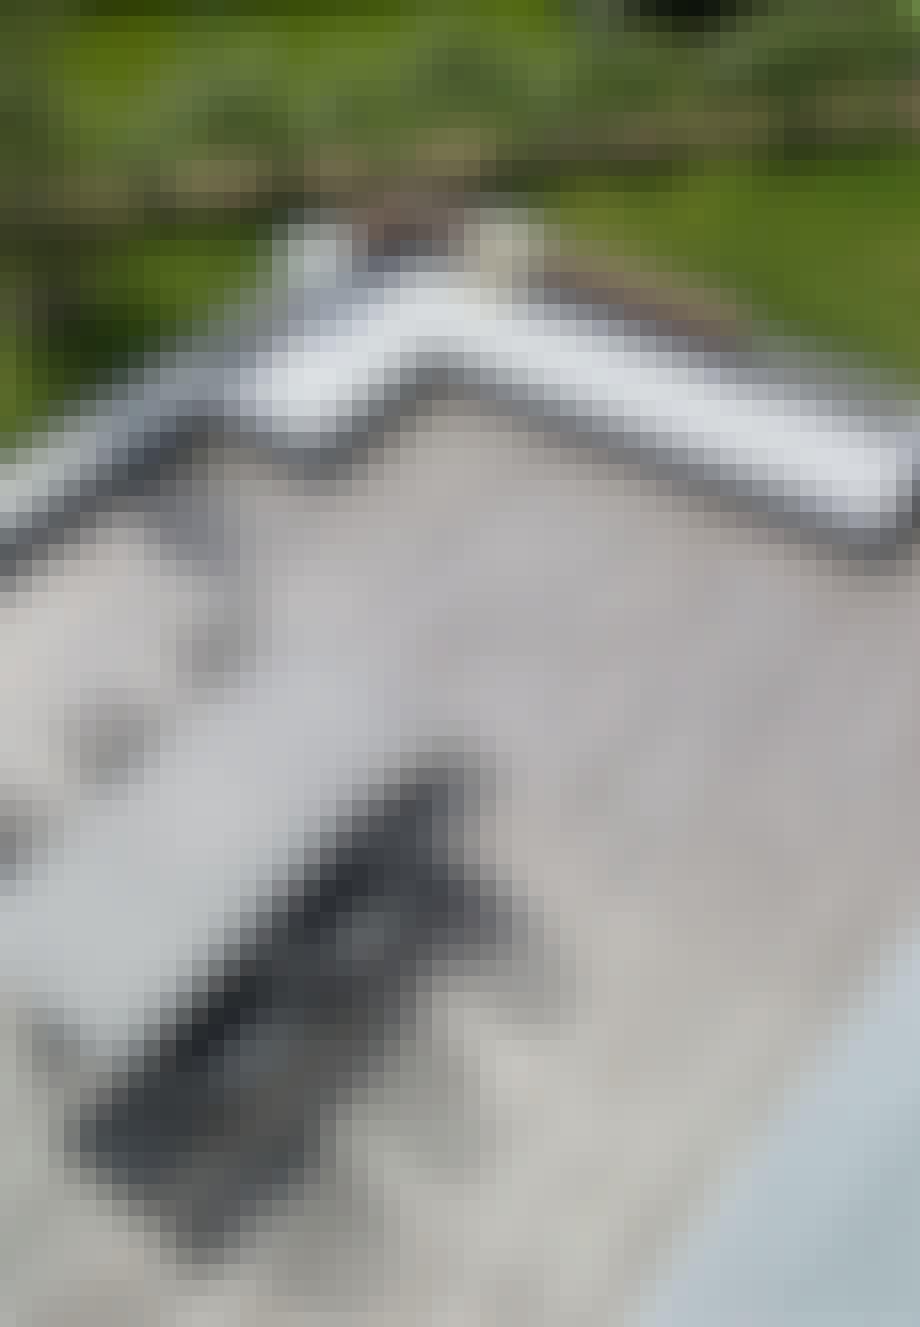 Granitsokkel som siddeplads